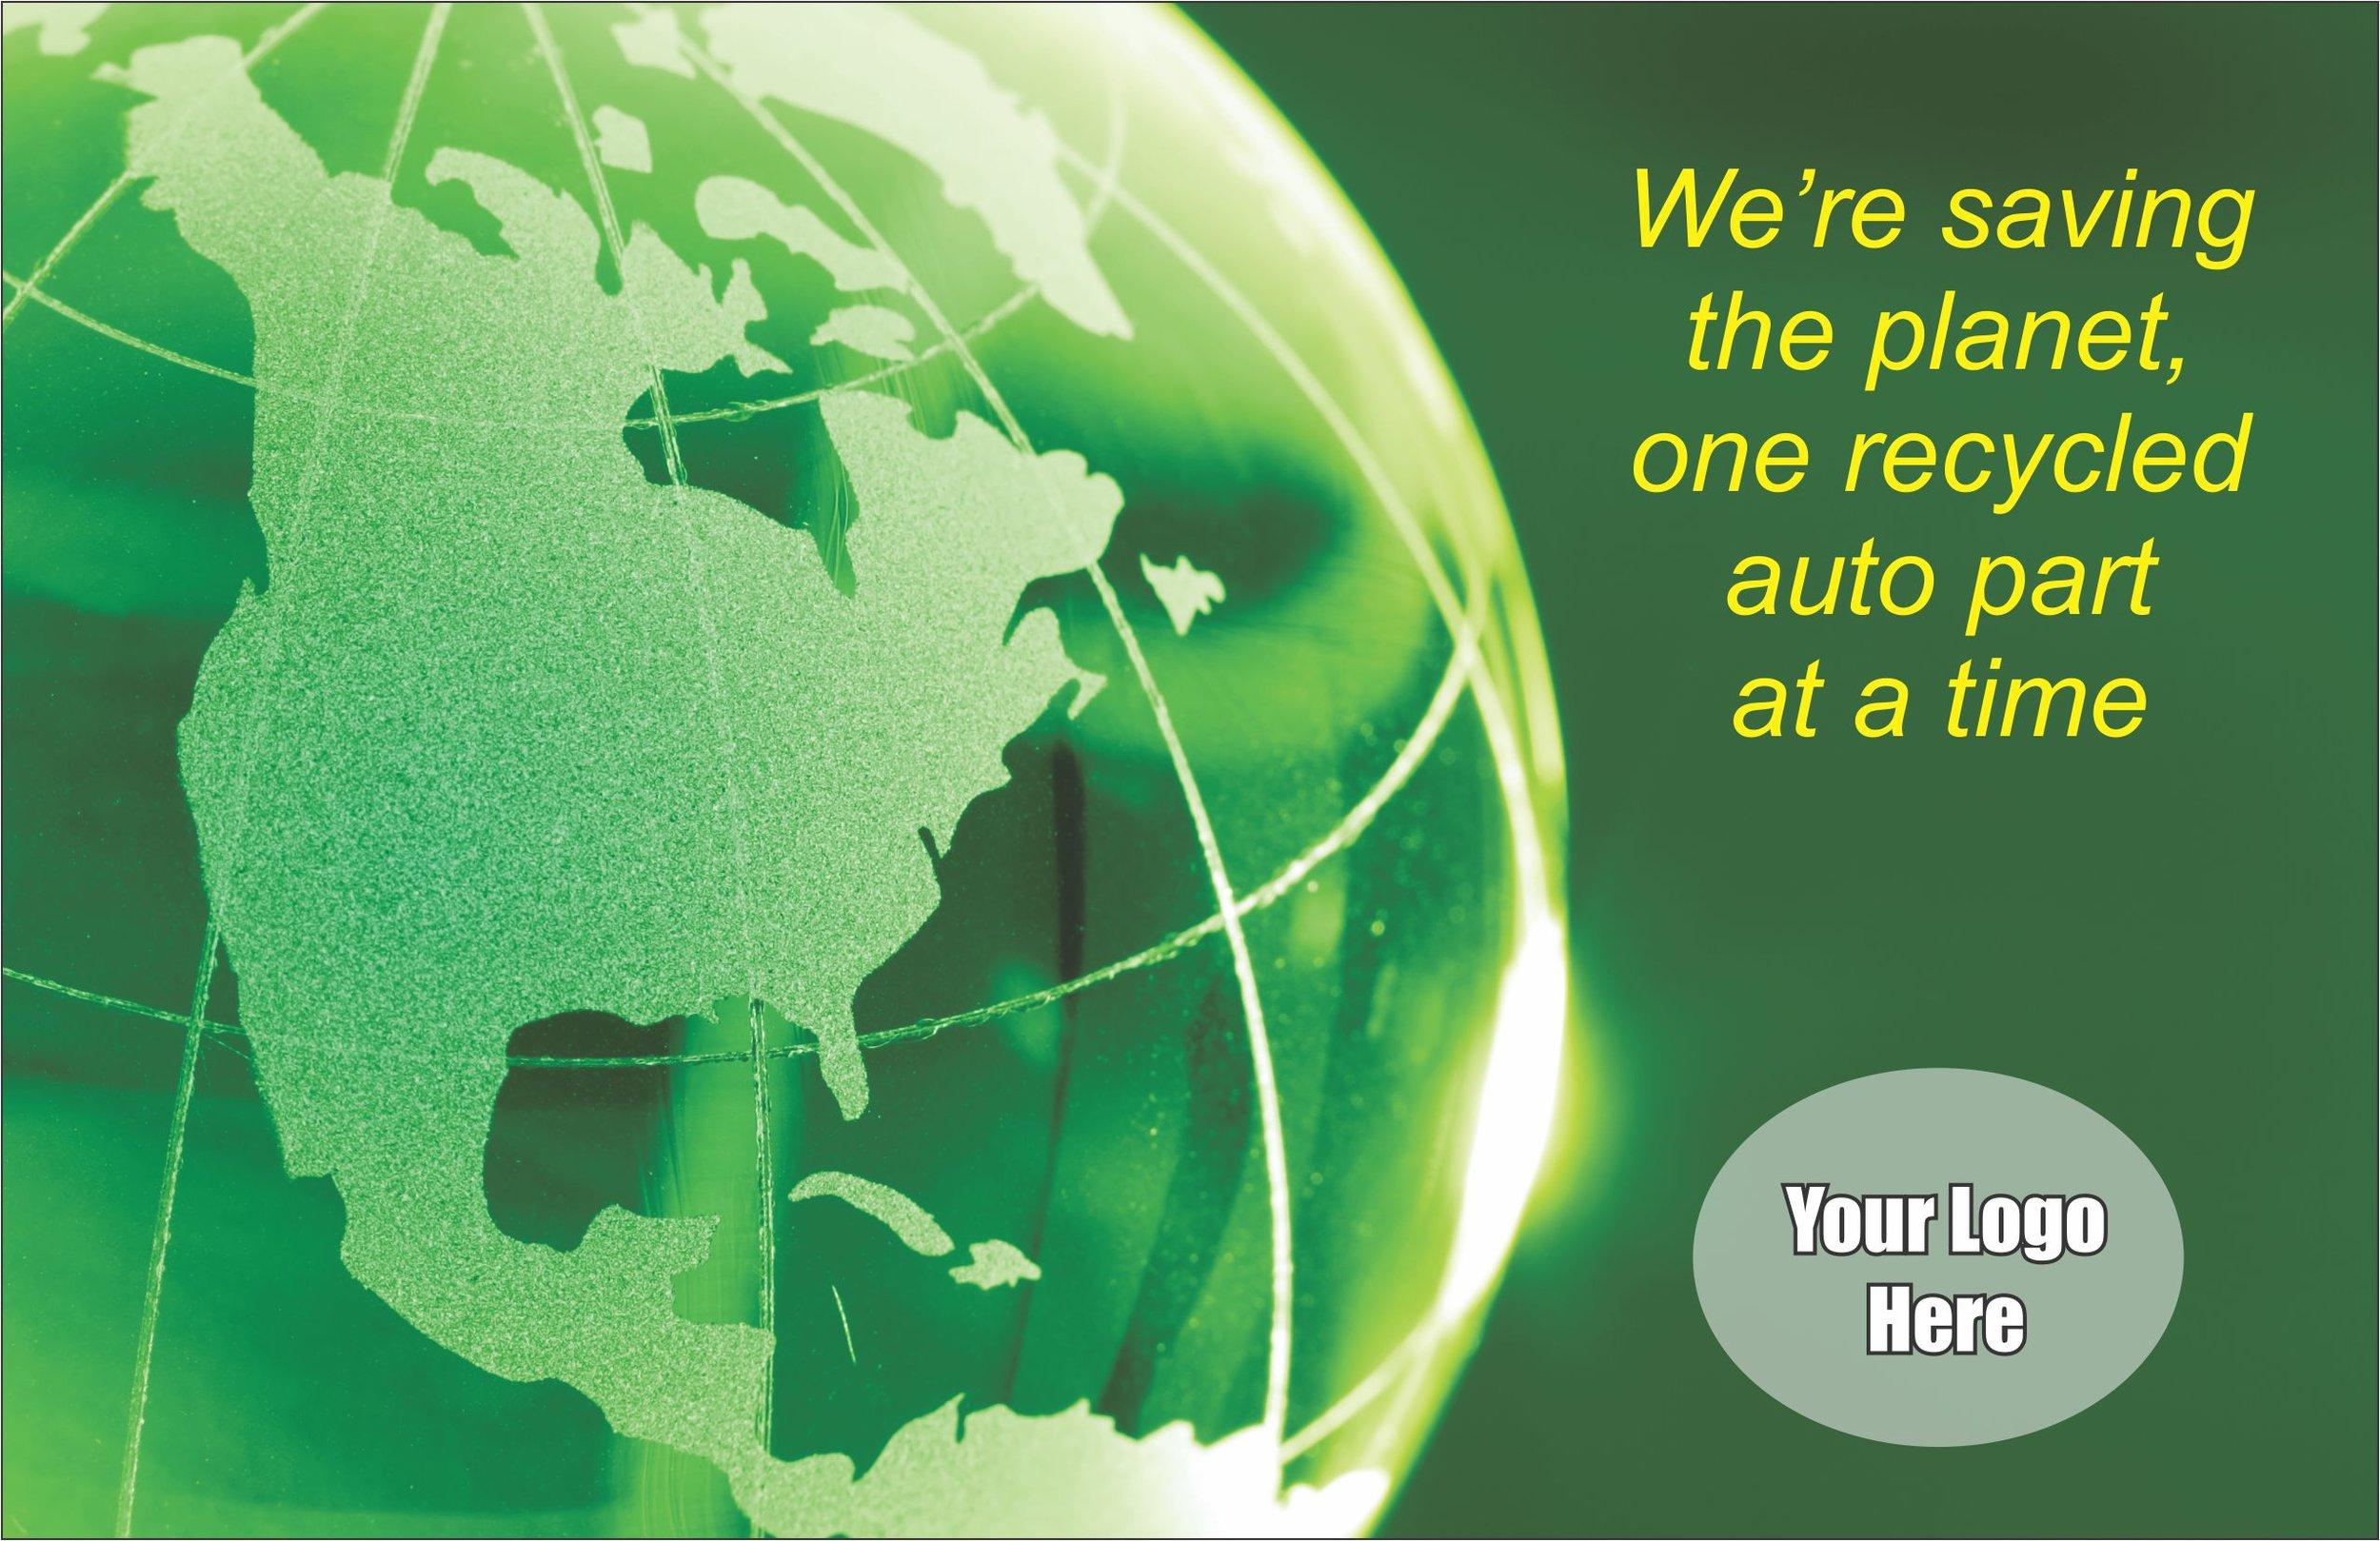 We're Saving the Planet.jpg